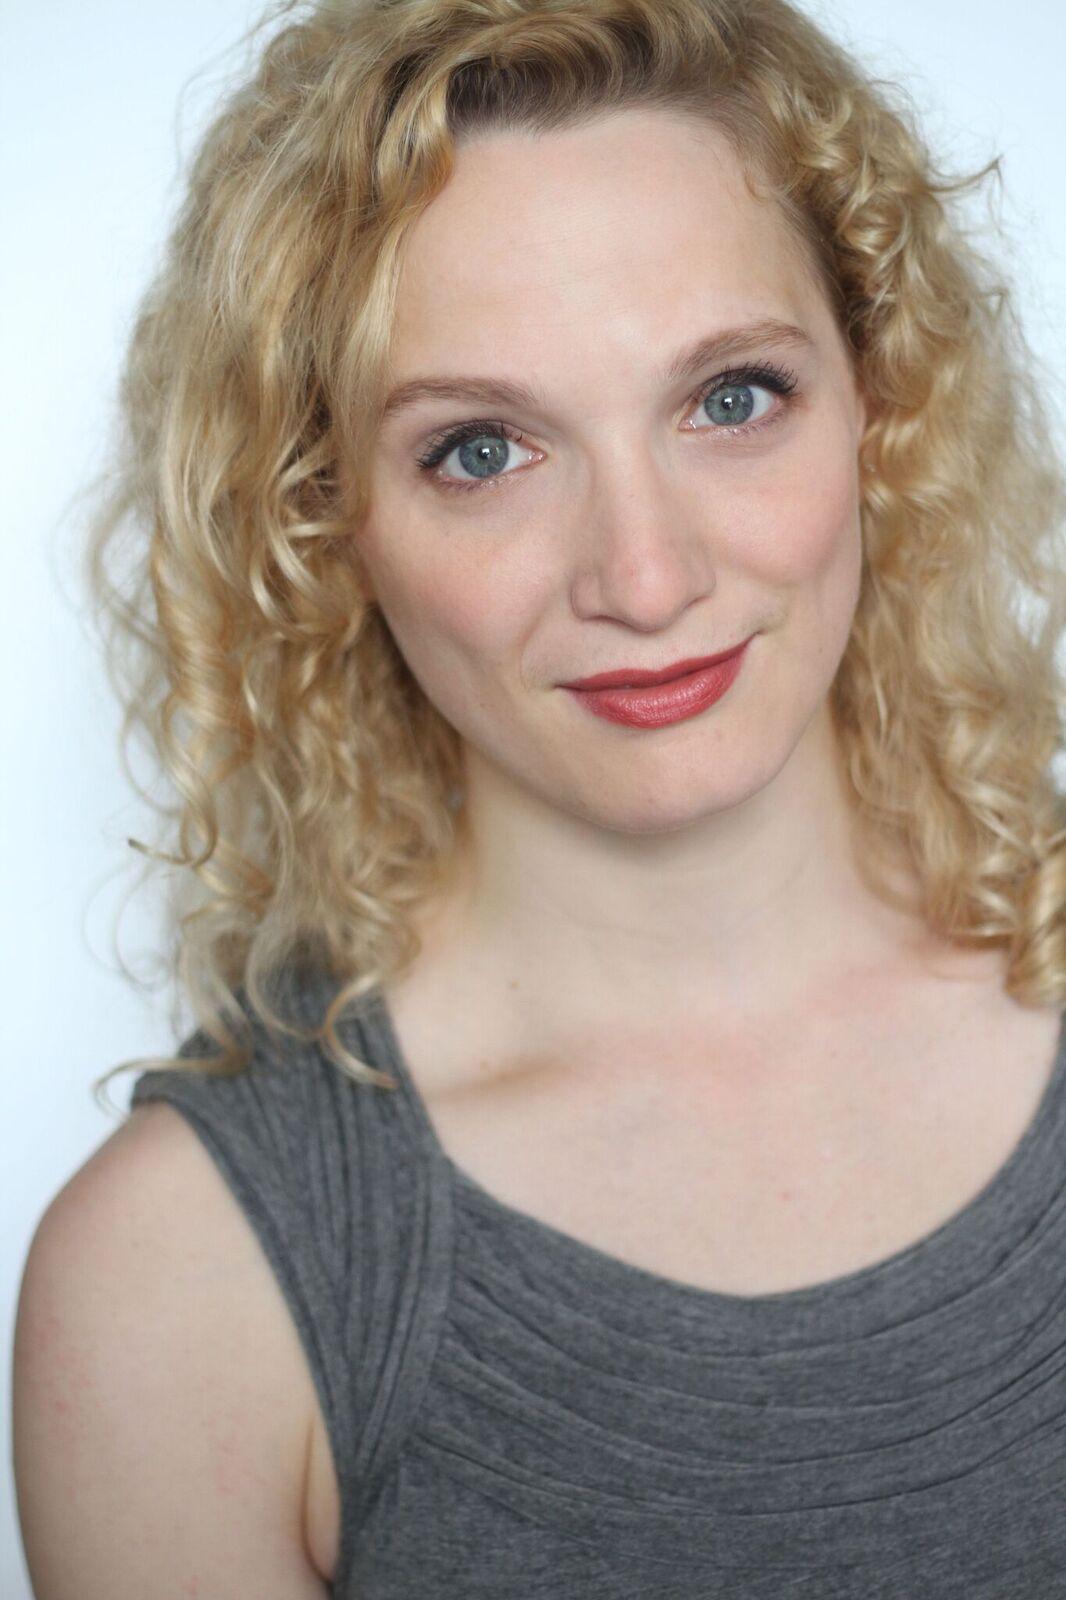 Jessica Bedford